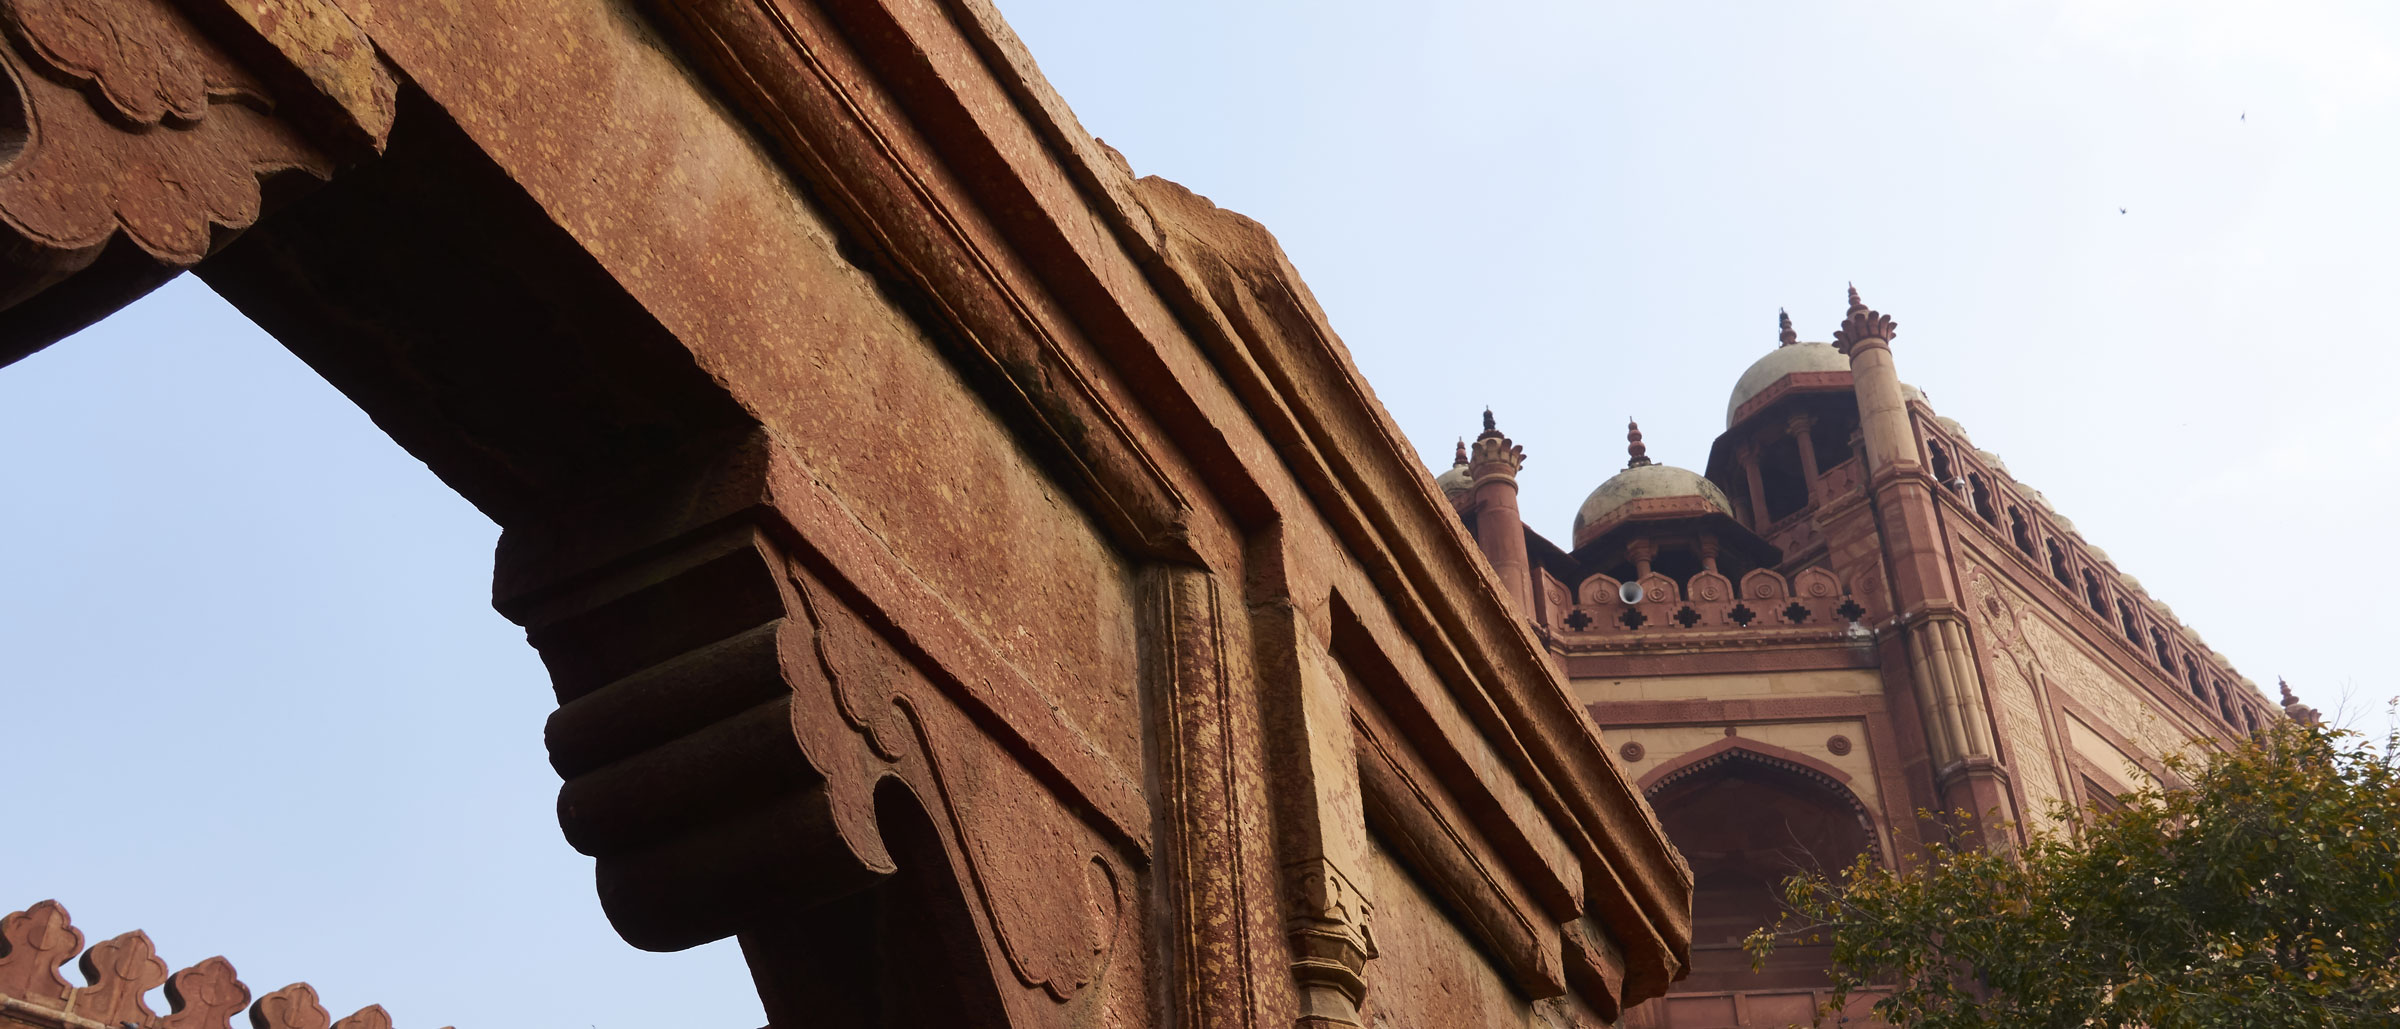 Stone archways against a light blue sky